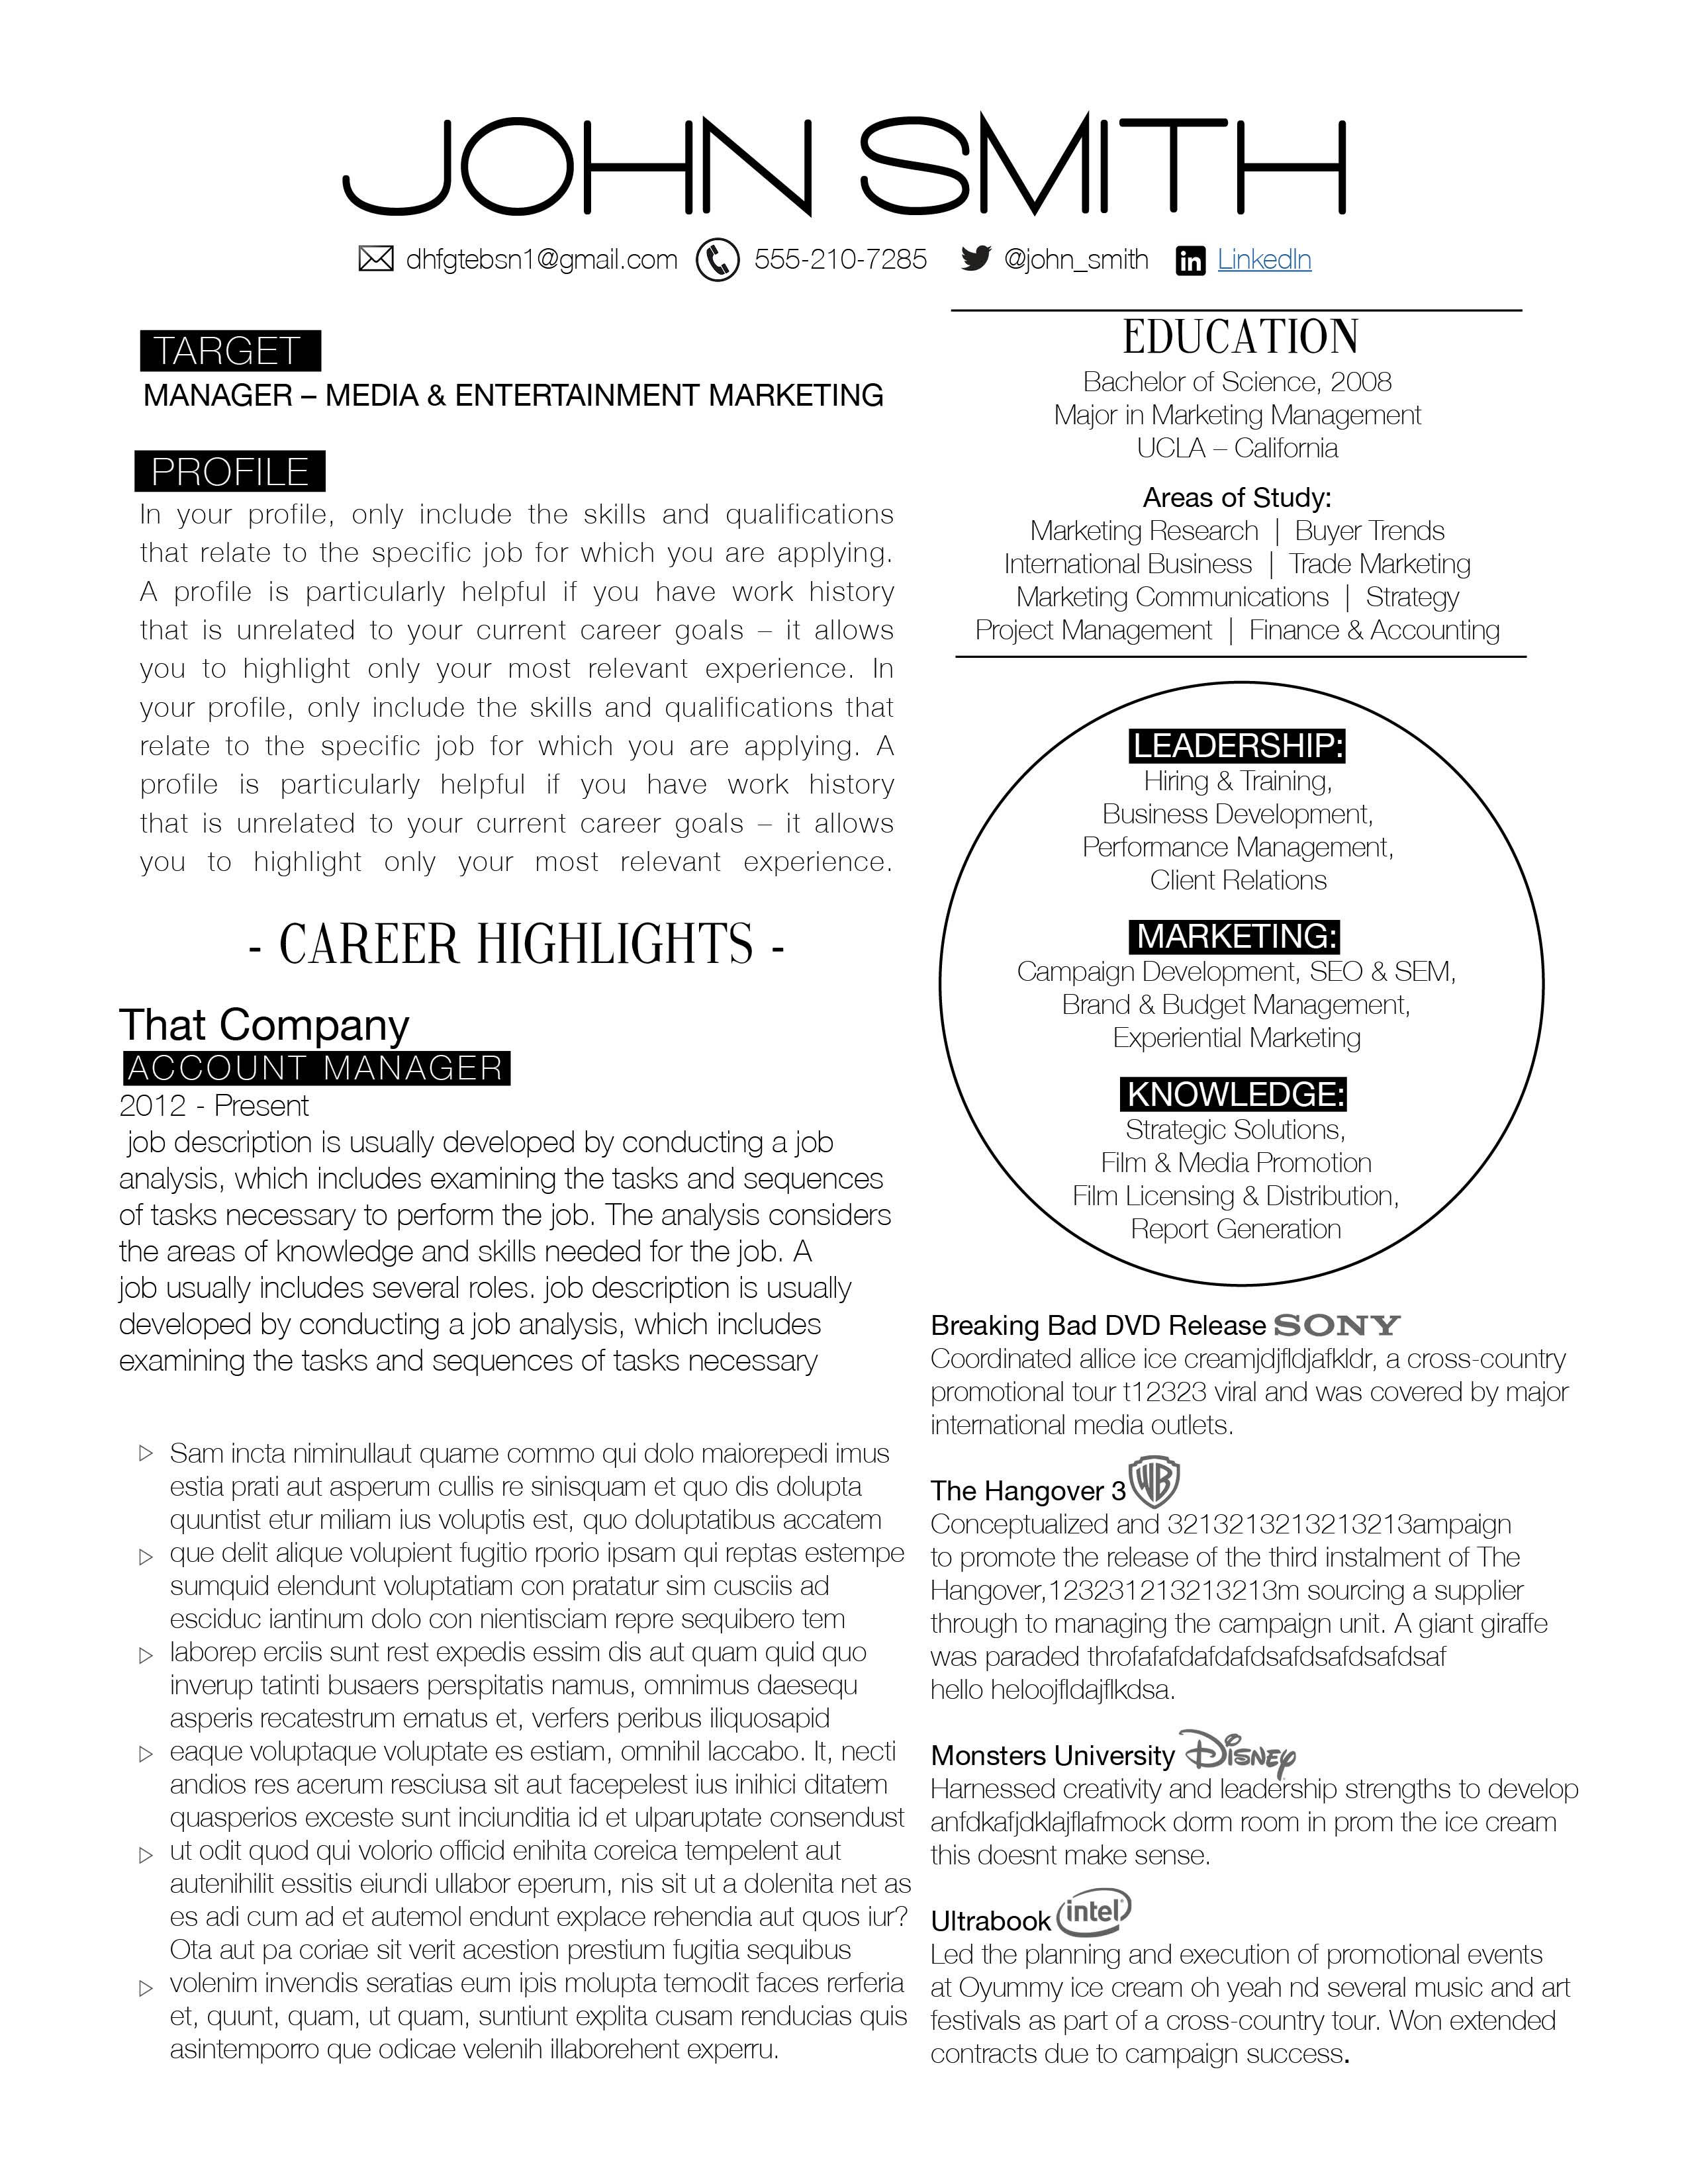 Male Resume, Female Resume, Corporate Resume, Modern Resume, Resume  Downloads